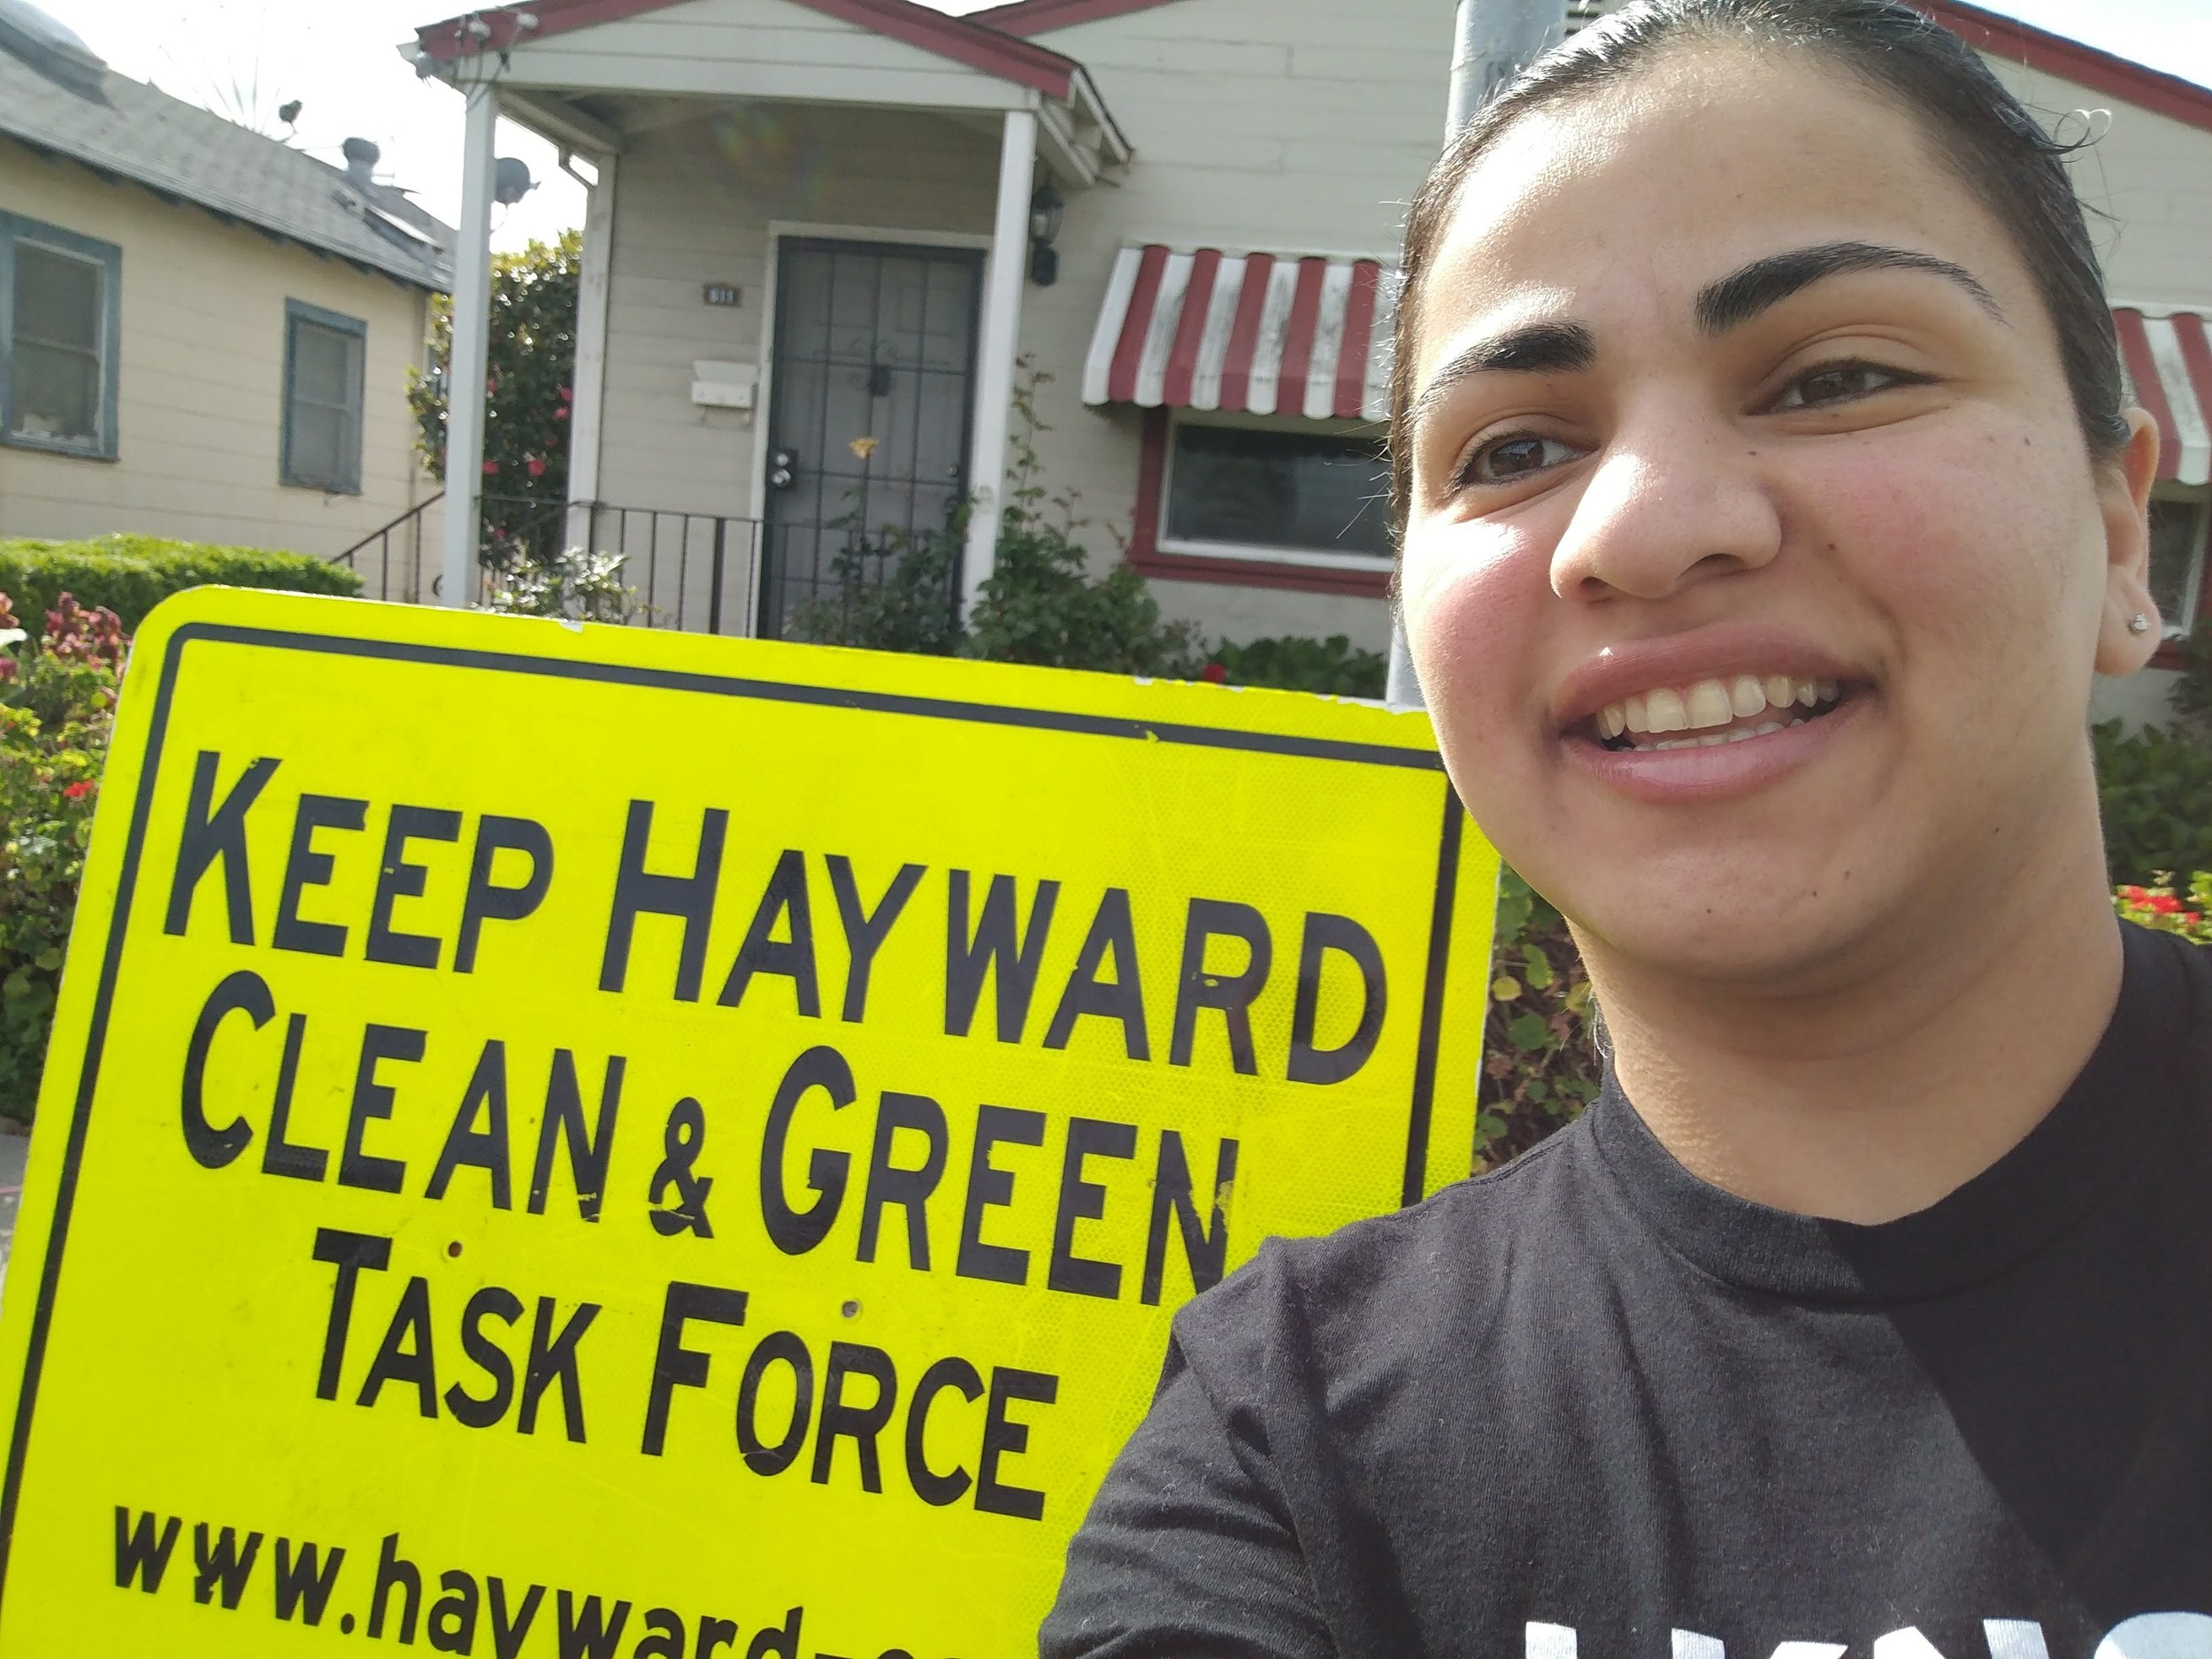 Keeping Hayward Clean